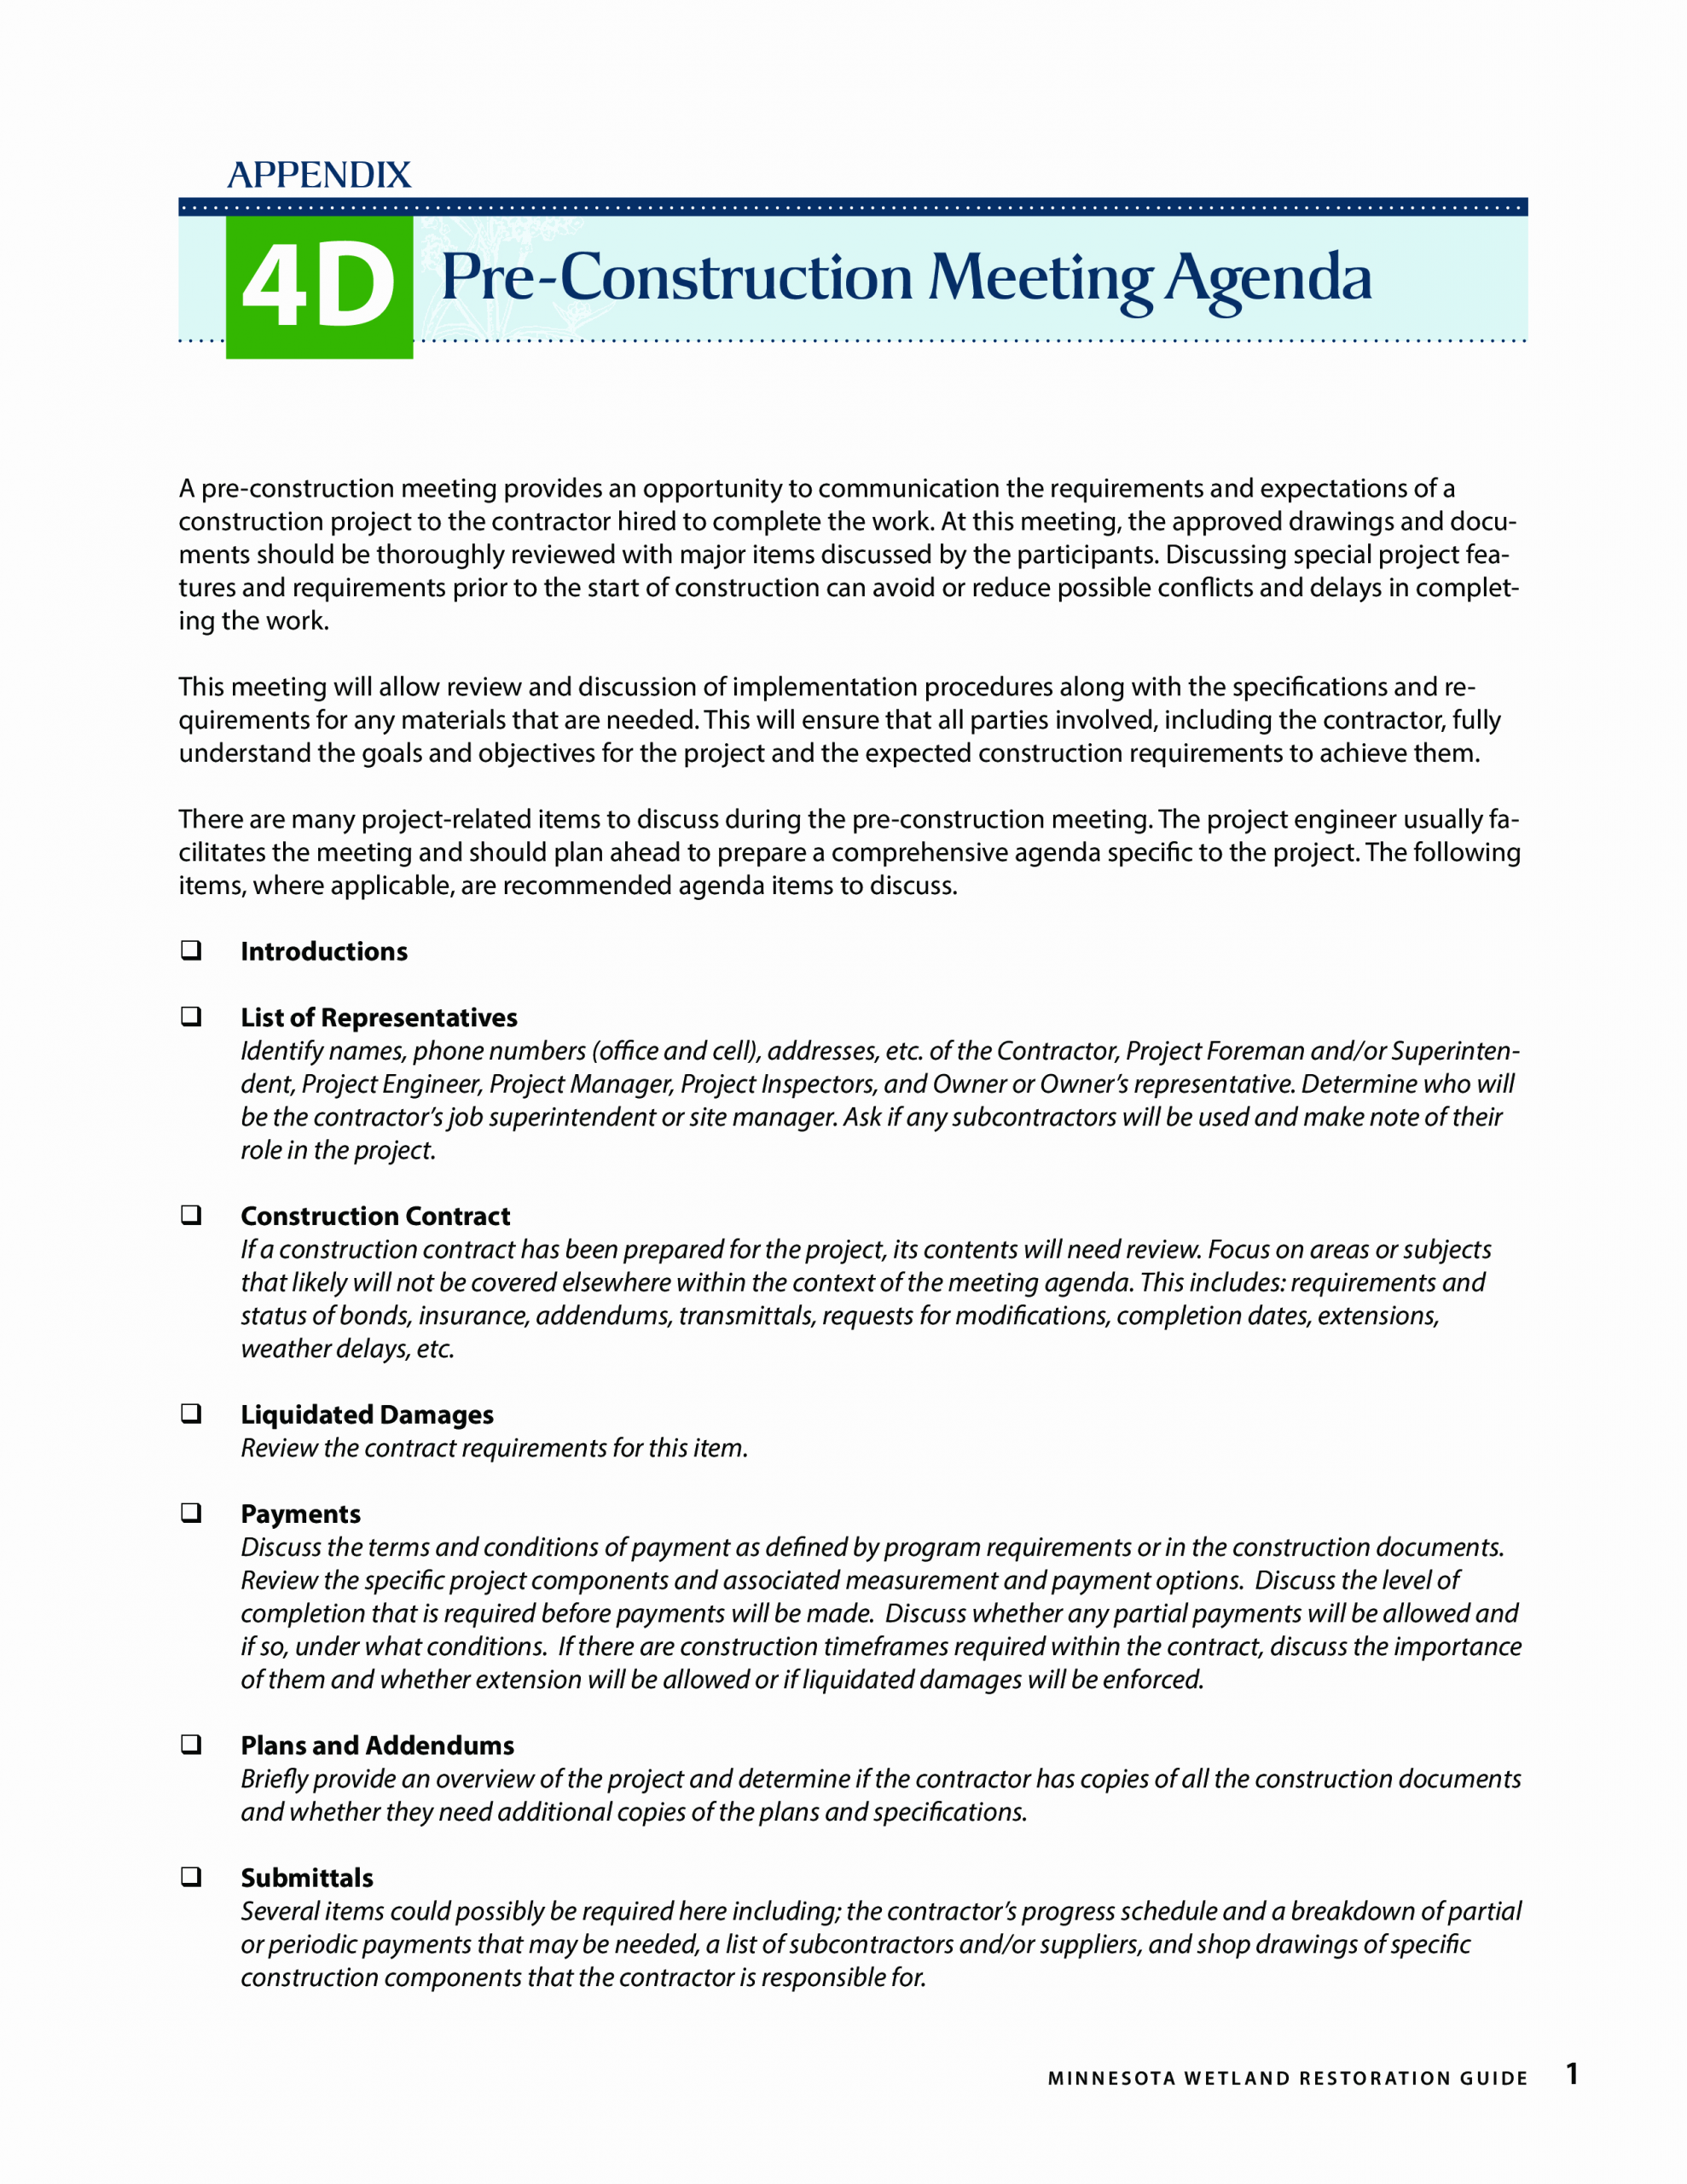 Pre Construction Meeting Agenda Template Awesome Pre Construction Meeting Agenda